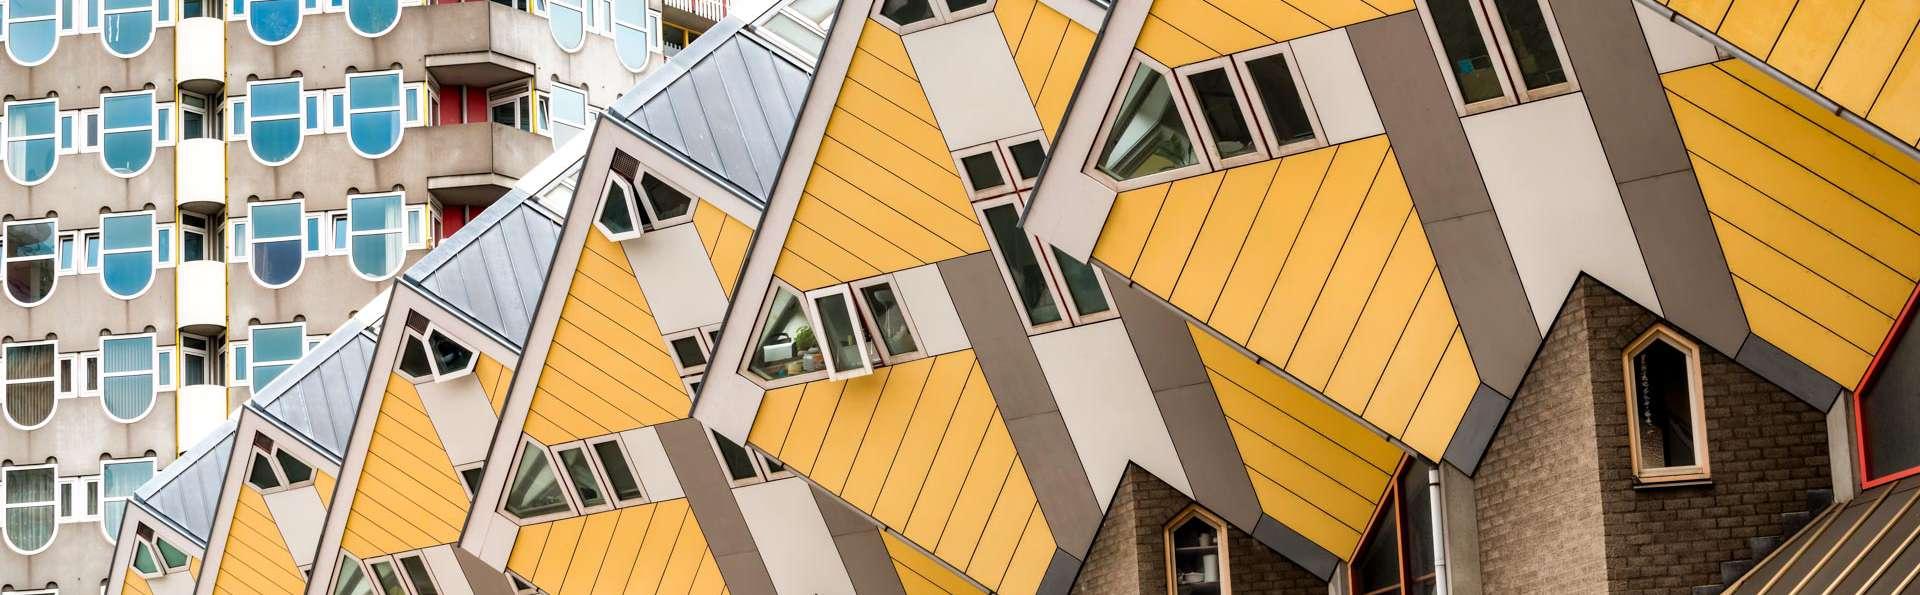 171. Urban Design Hotel - EDIT_ROTTERDAM_05.jpg